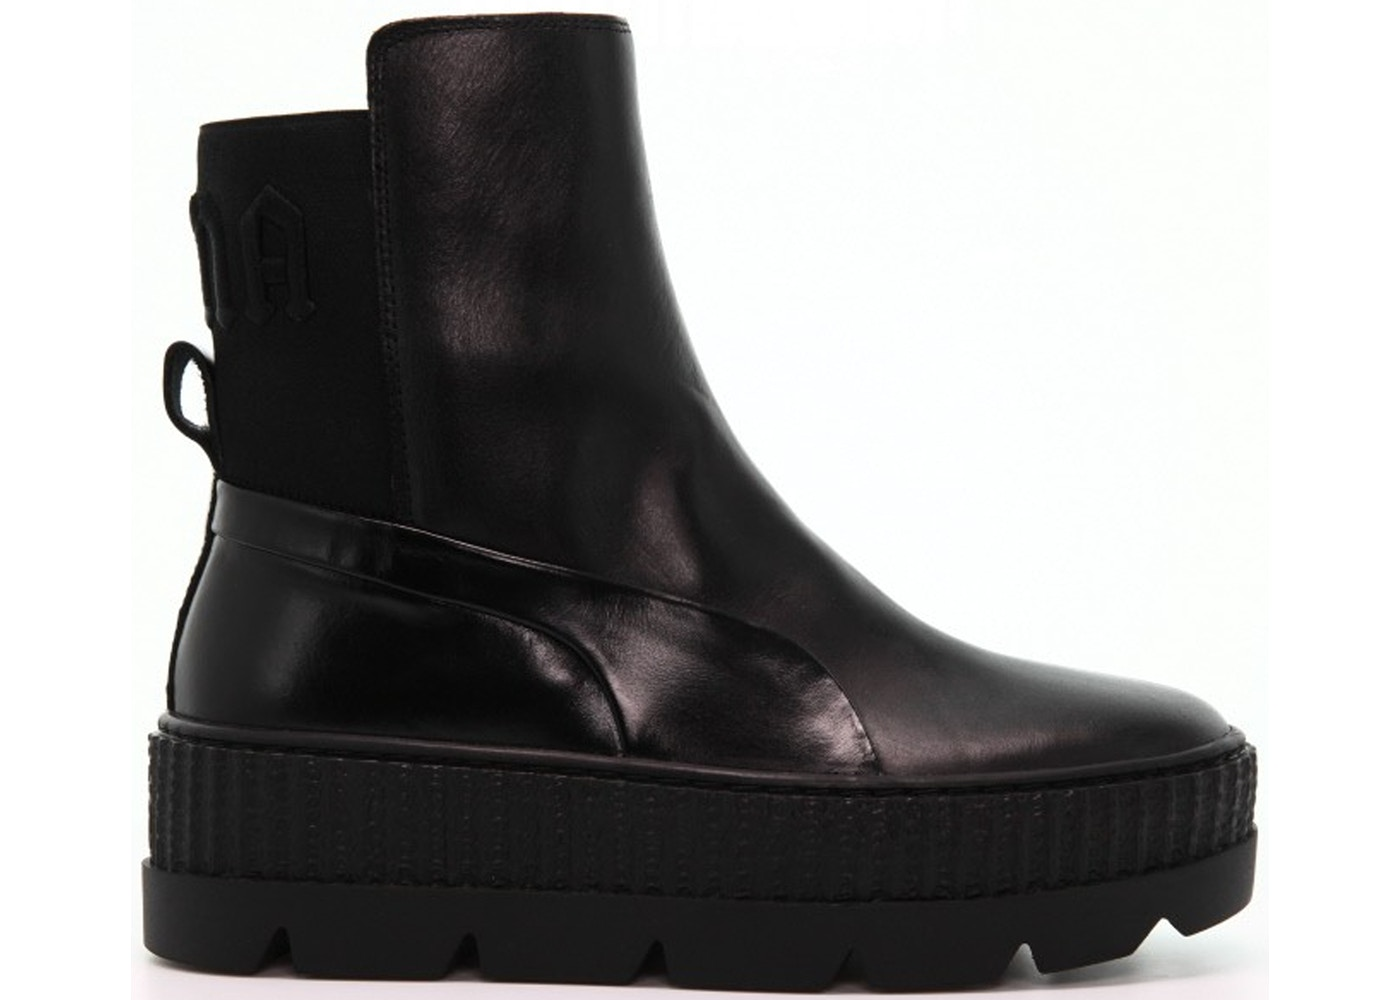 finest selection e4a8d 6c163 Puma Chelsea Sneaker Boot Rihanna Fenty Black (W)